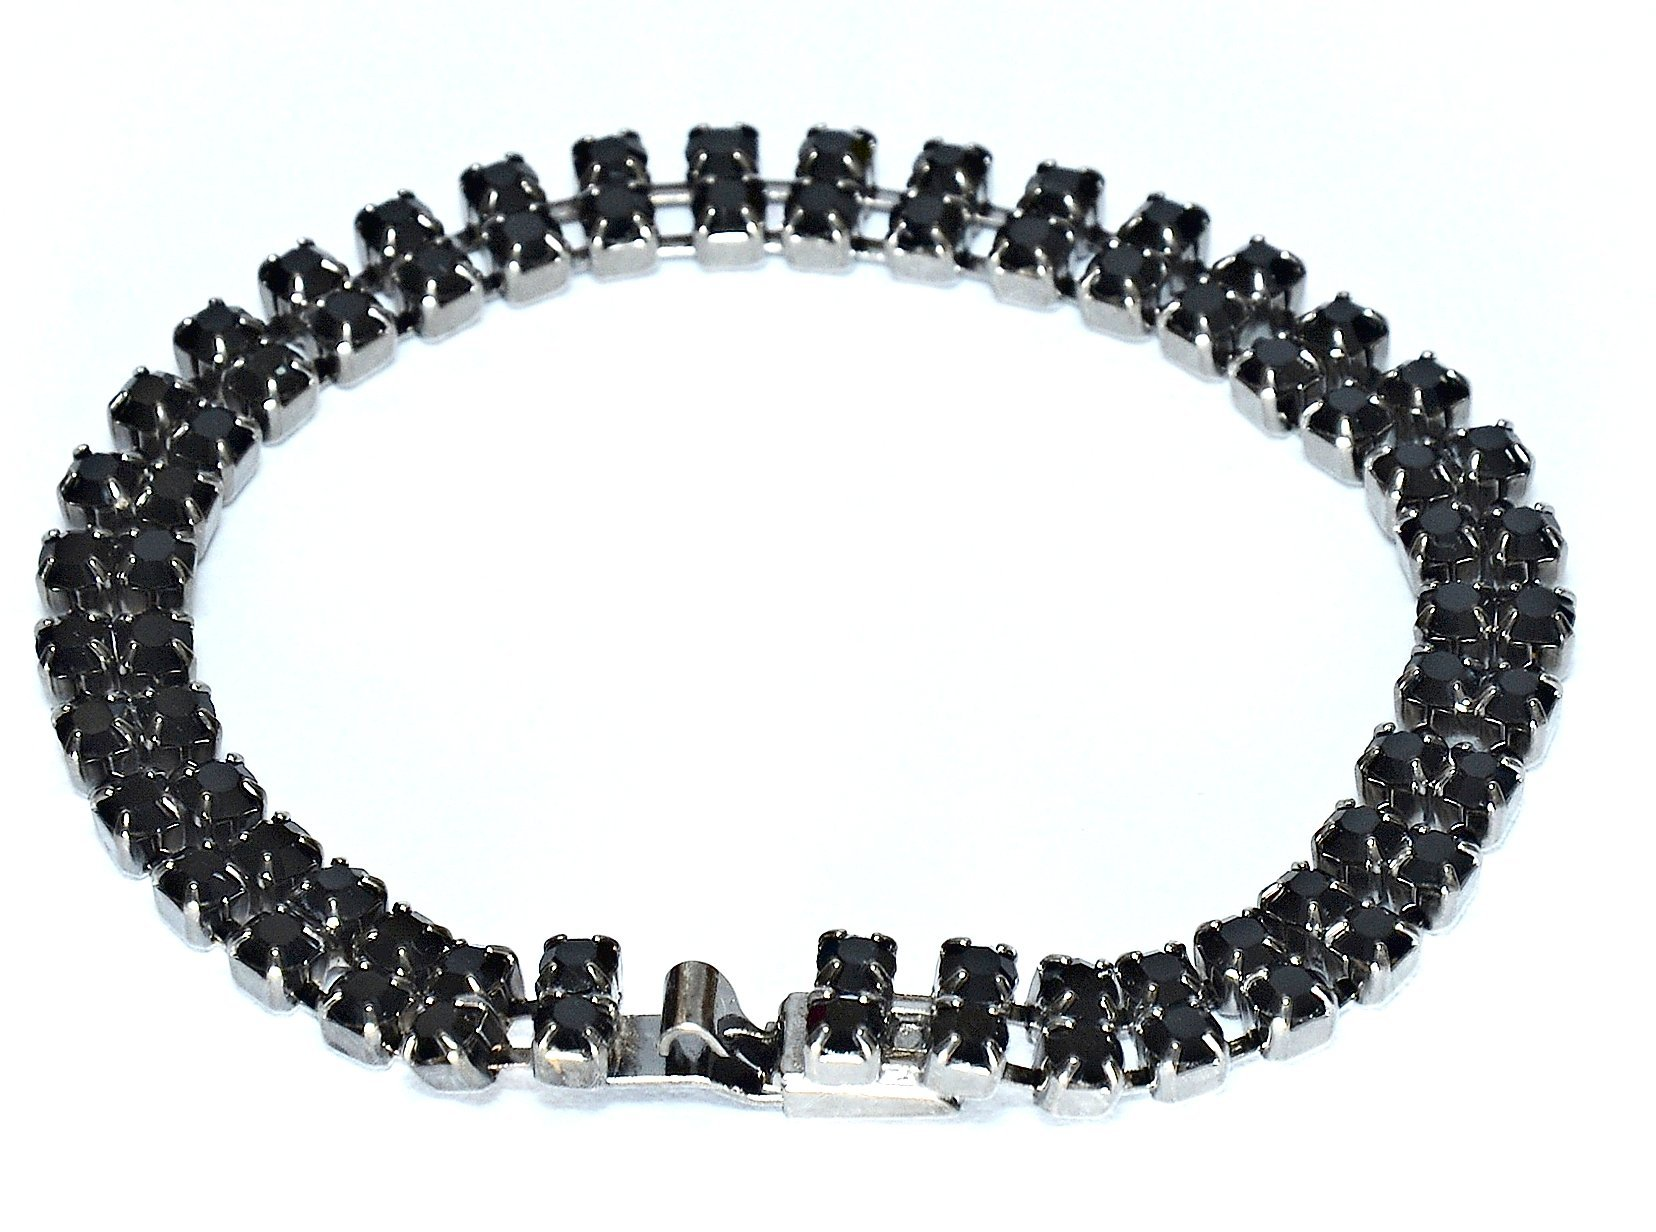 2 Row Tennis Swarovski Crystal Bracelet in Jet Plated / Jet Crystal Tennis Bracelet / Two Row Bracelet in Swarovski Crystal in Jet 165mm with Clasp in Swarovski crystal in Jet & Gunmetal Finish